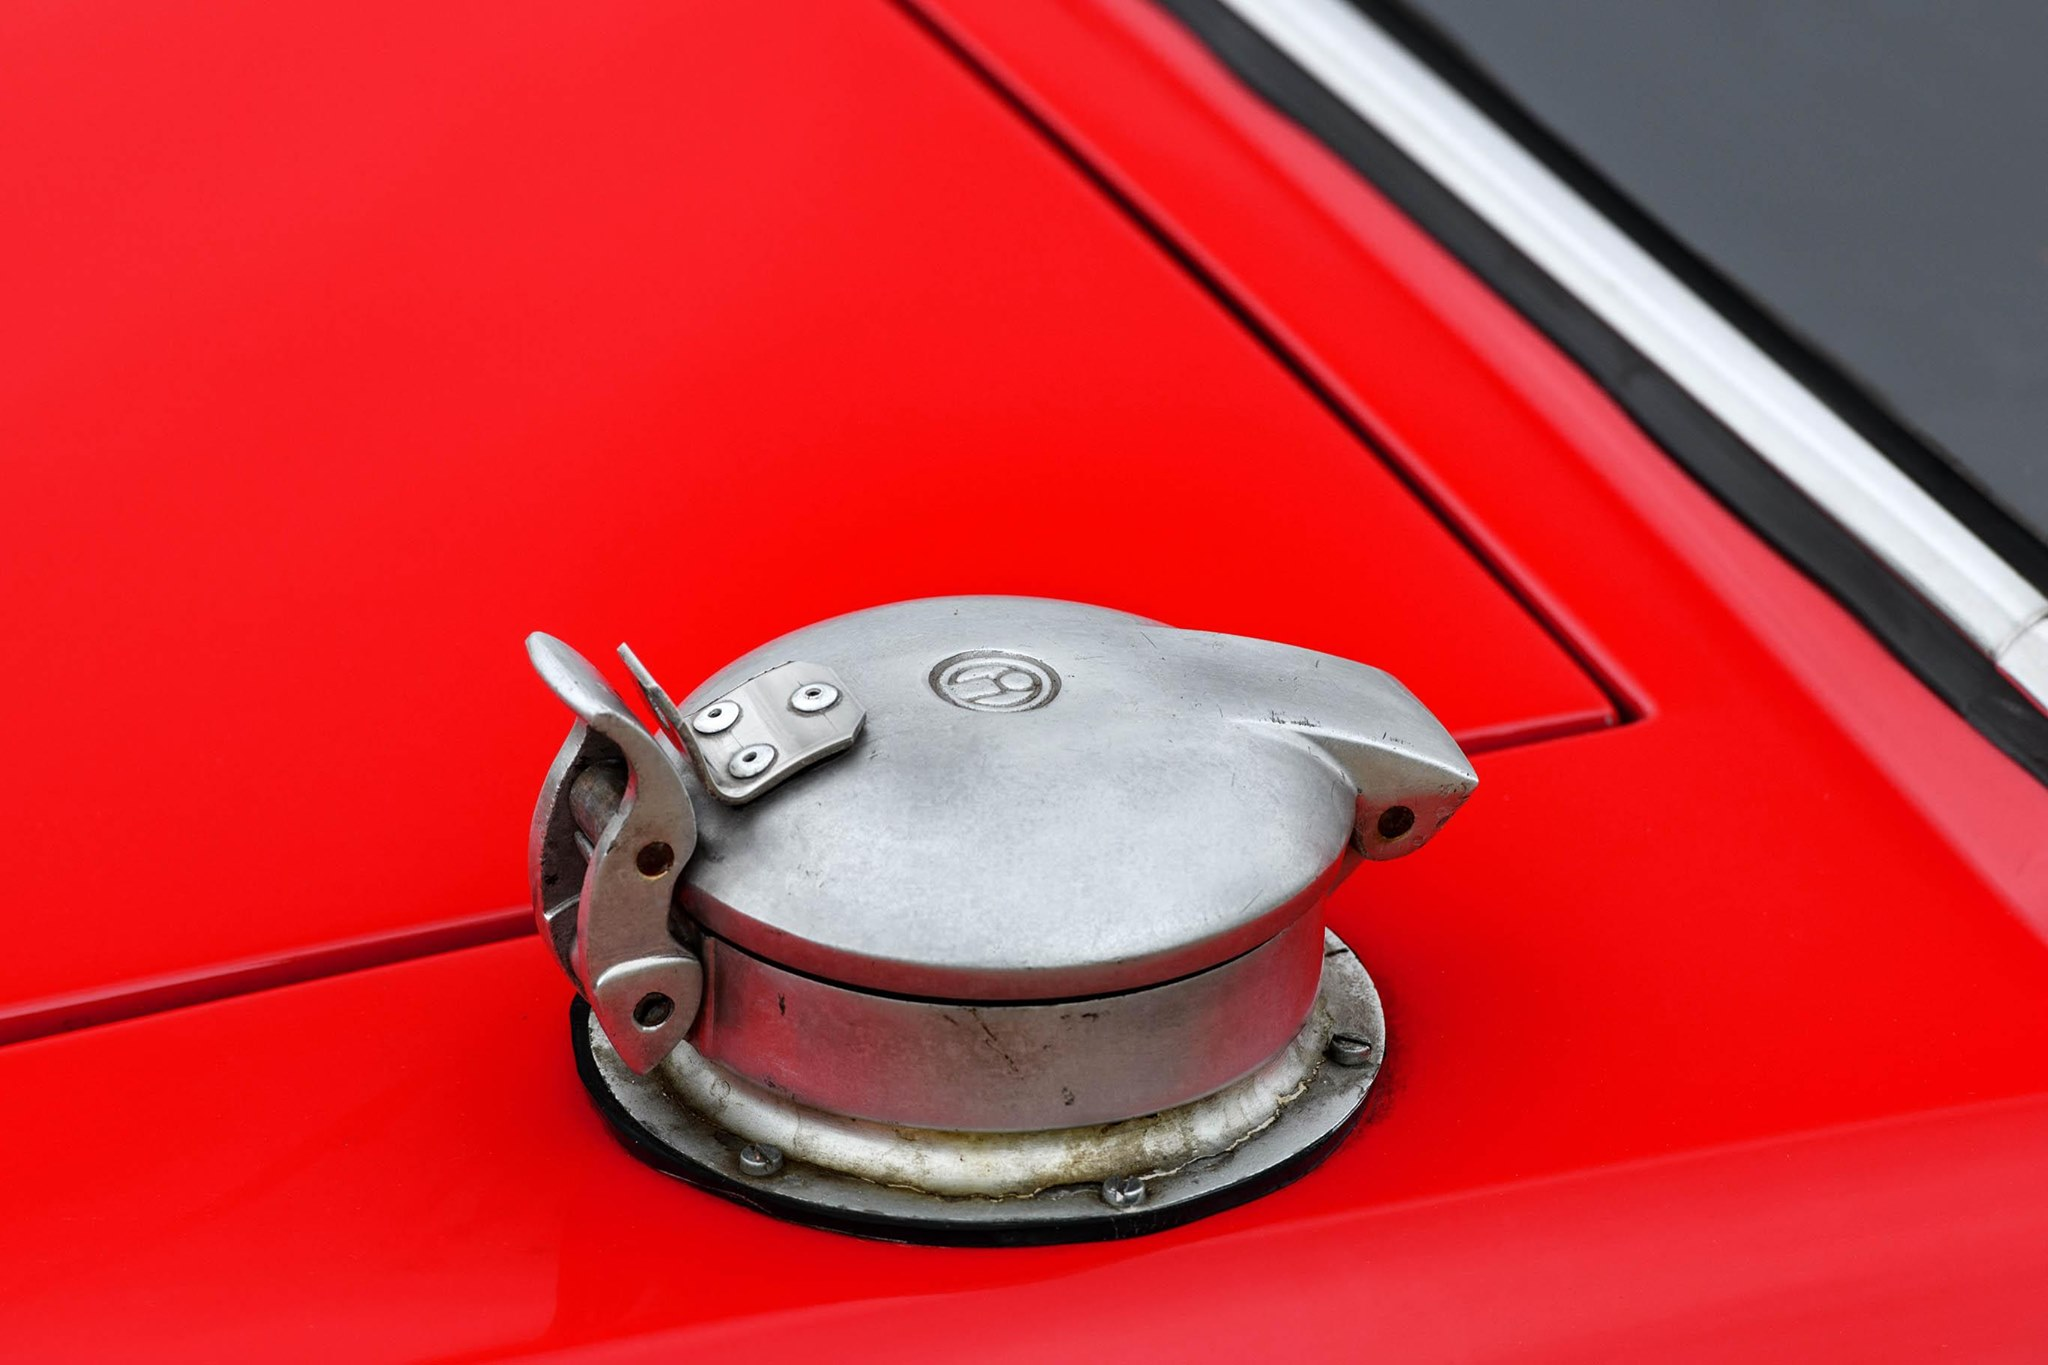 Lancia-Fulvia-Coupe-Rallye-1.6-HF-Fanalone-2